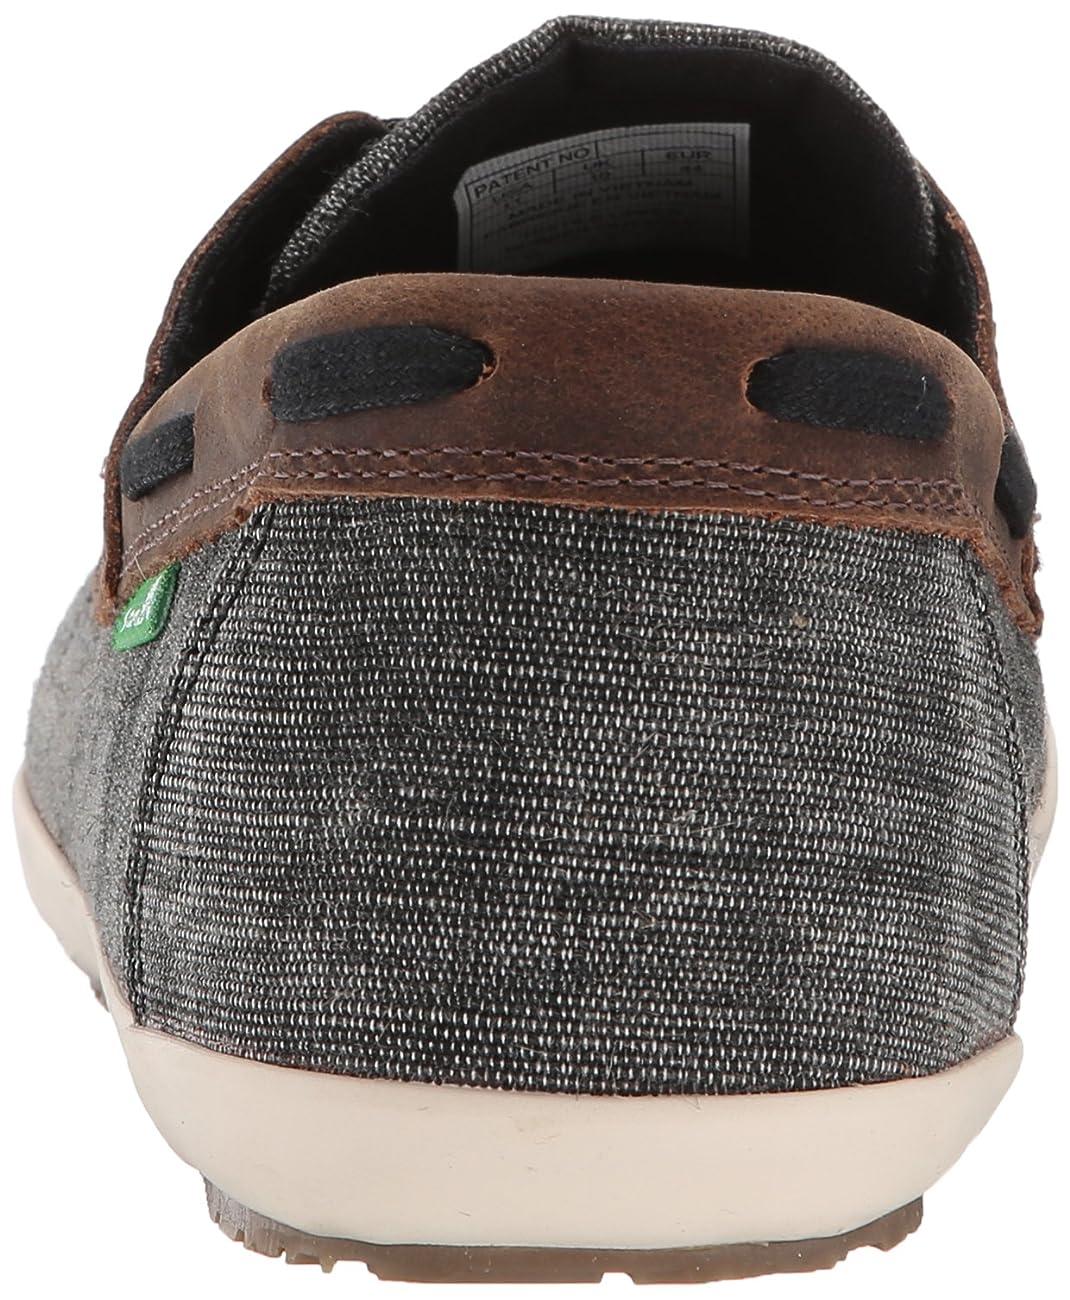 Sanuk Men's Casa Barco Vintage Boat Shoe 2